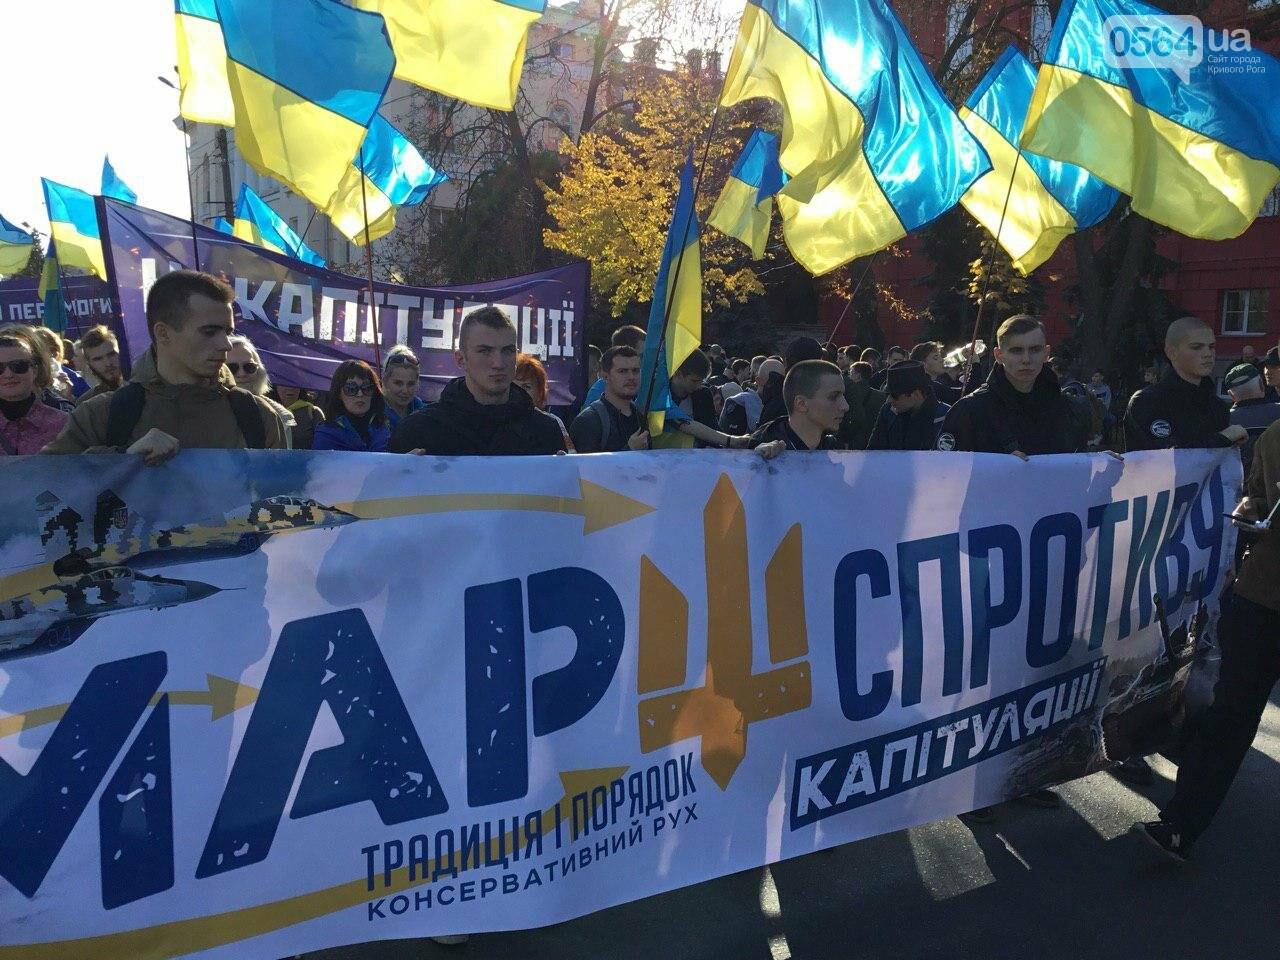 Криворожане поддержали Марш сопротивления капитуляции в Киеве, - ФОТО, ВИДЕО, ОБНОВЛЕНО, фото-2